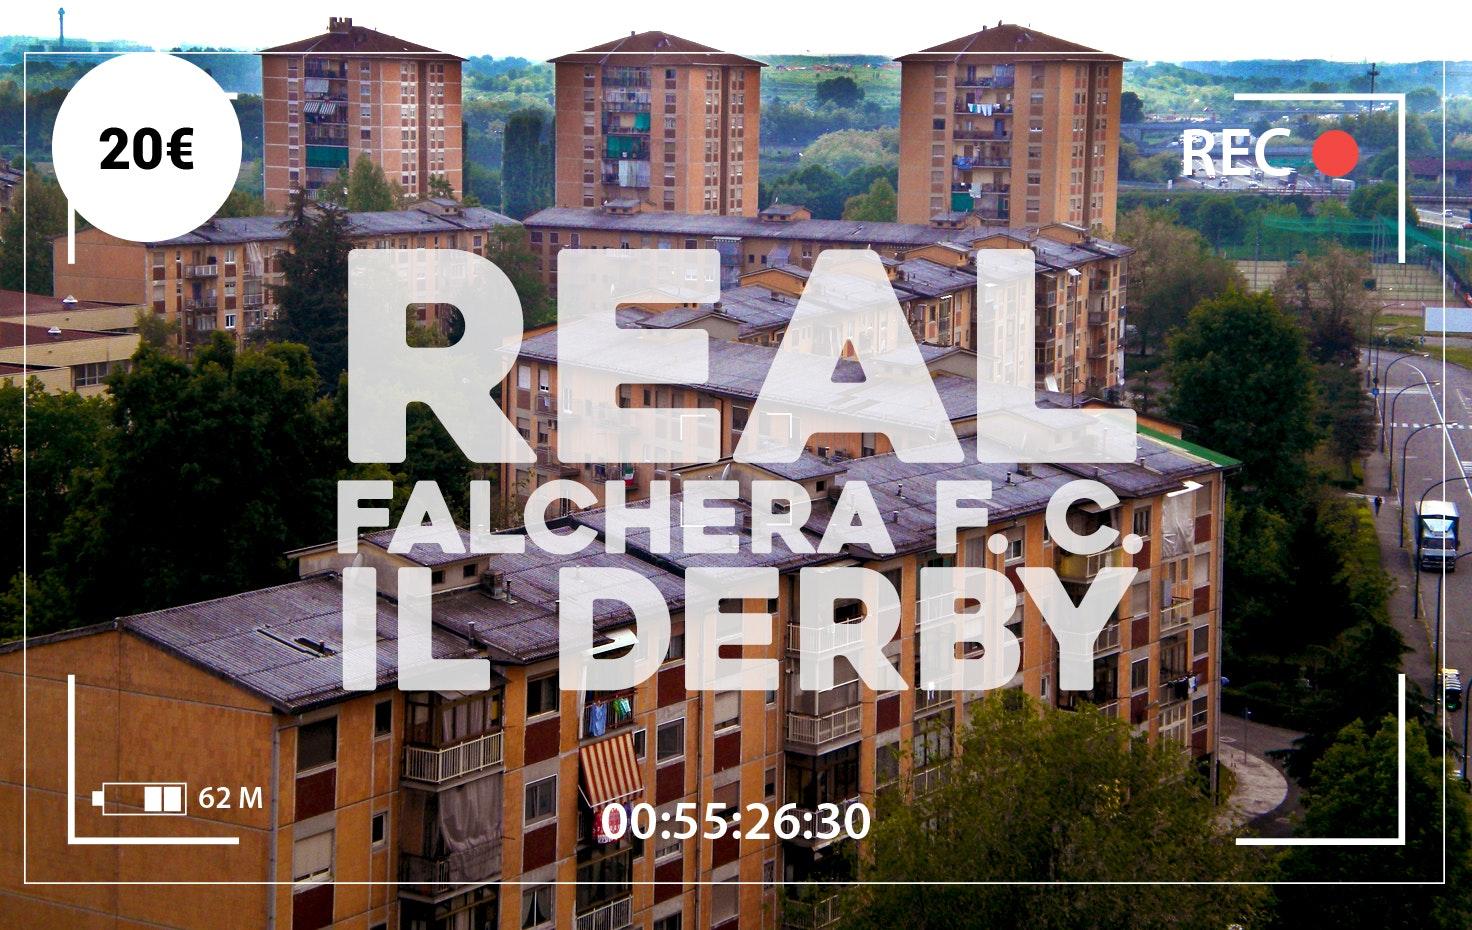 Real Falchera F. C. - Il Derby